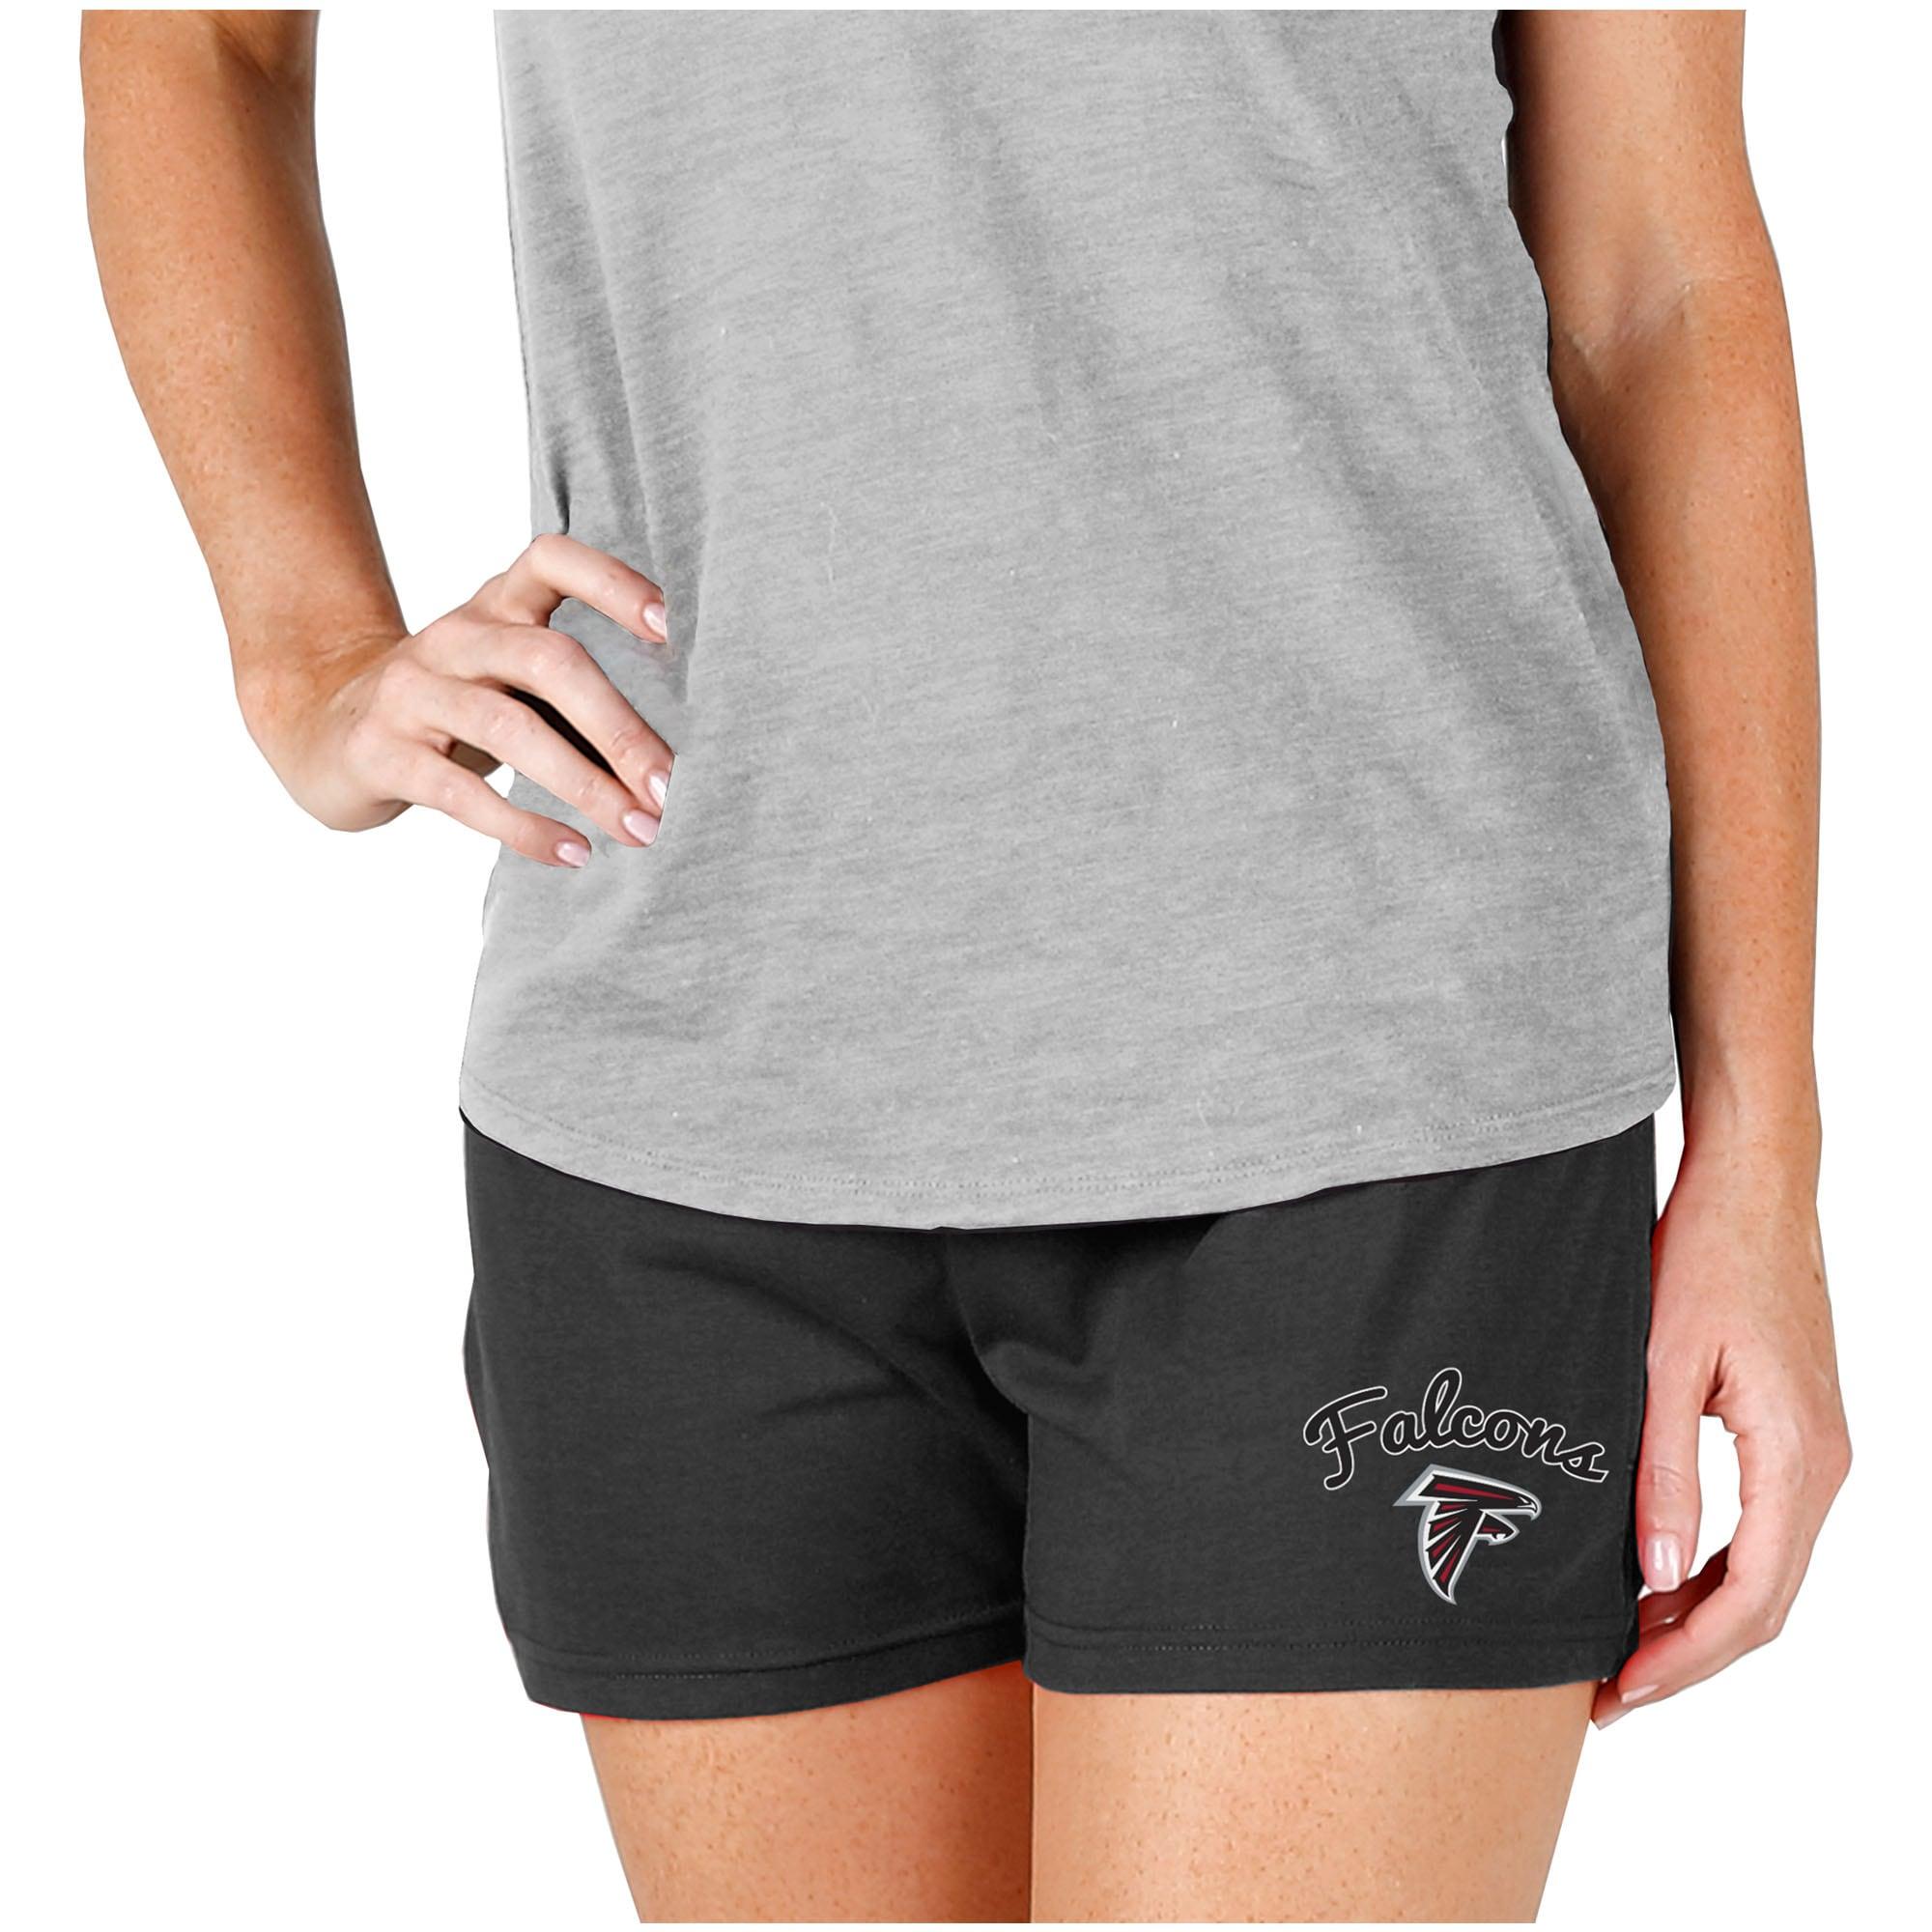 Atlanta Falcons Concepts Sport Women's Knit Shorts - Charcoal